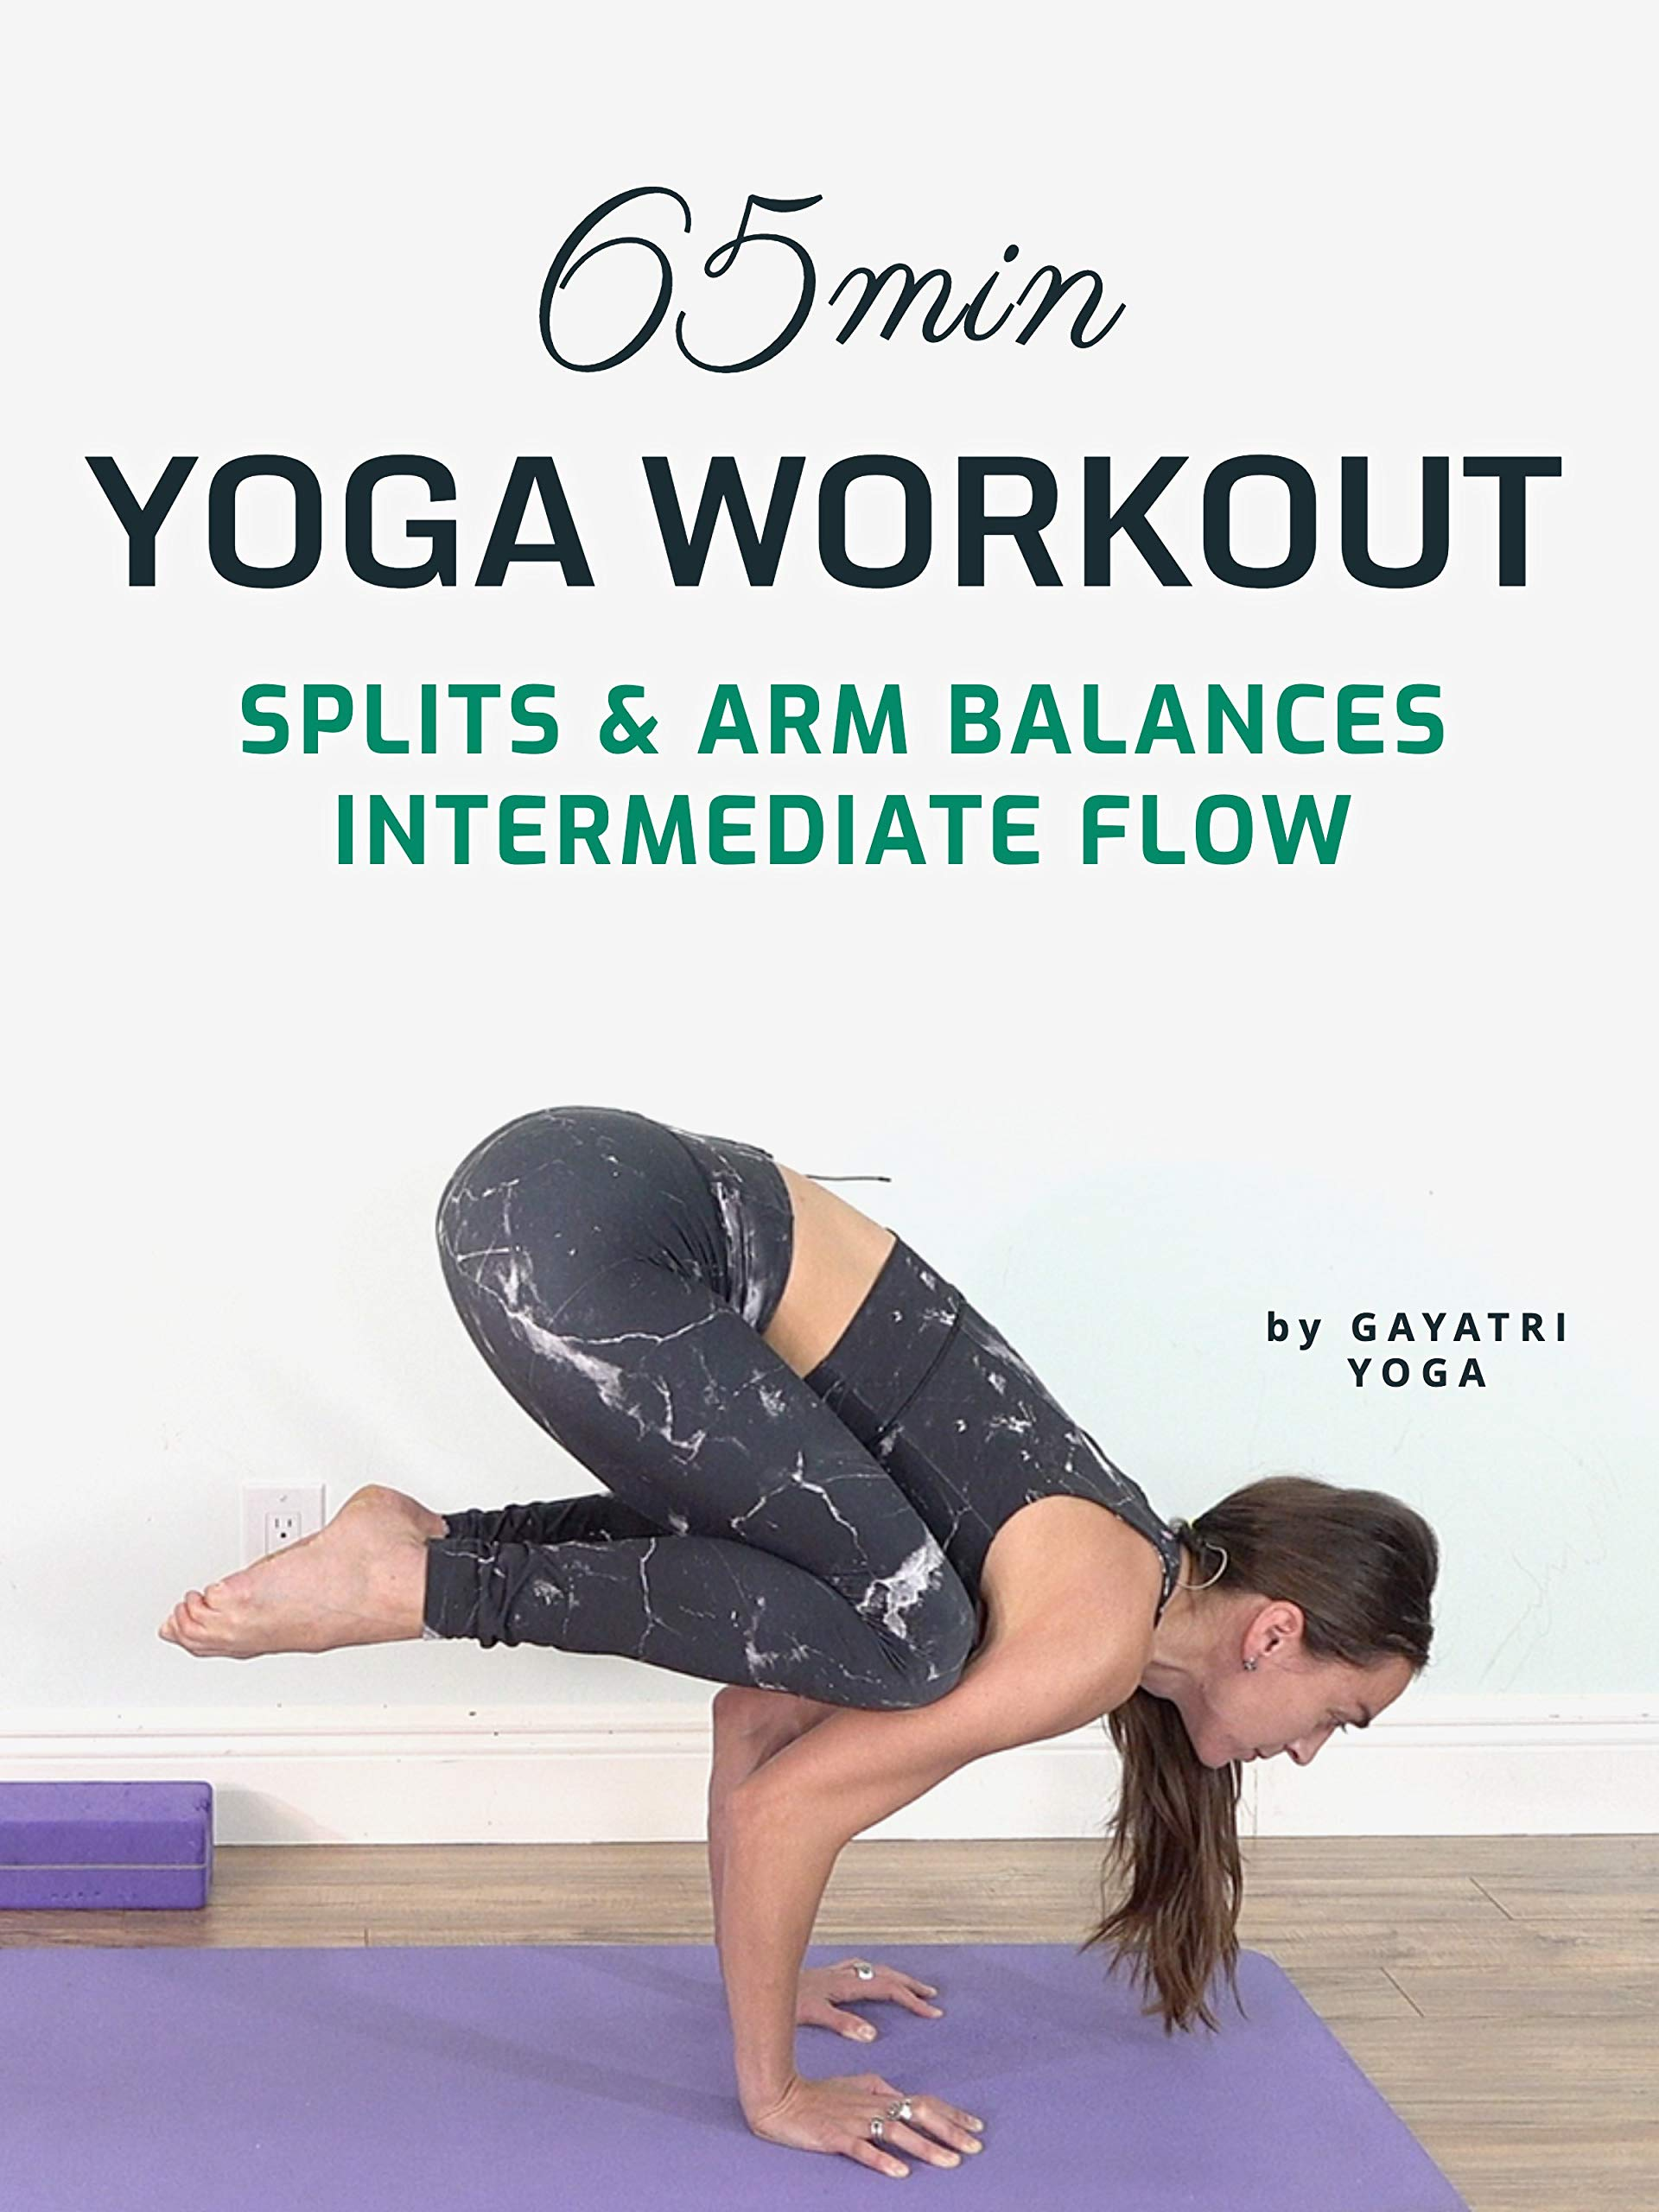 65 Min Yoga Workout - Splits & Arm Balance Intermediate Flow - Gayatri Yoga